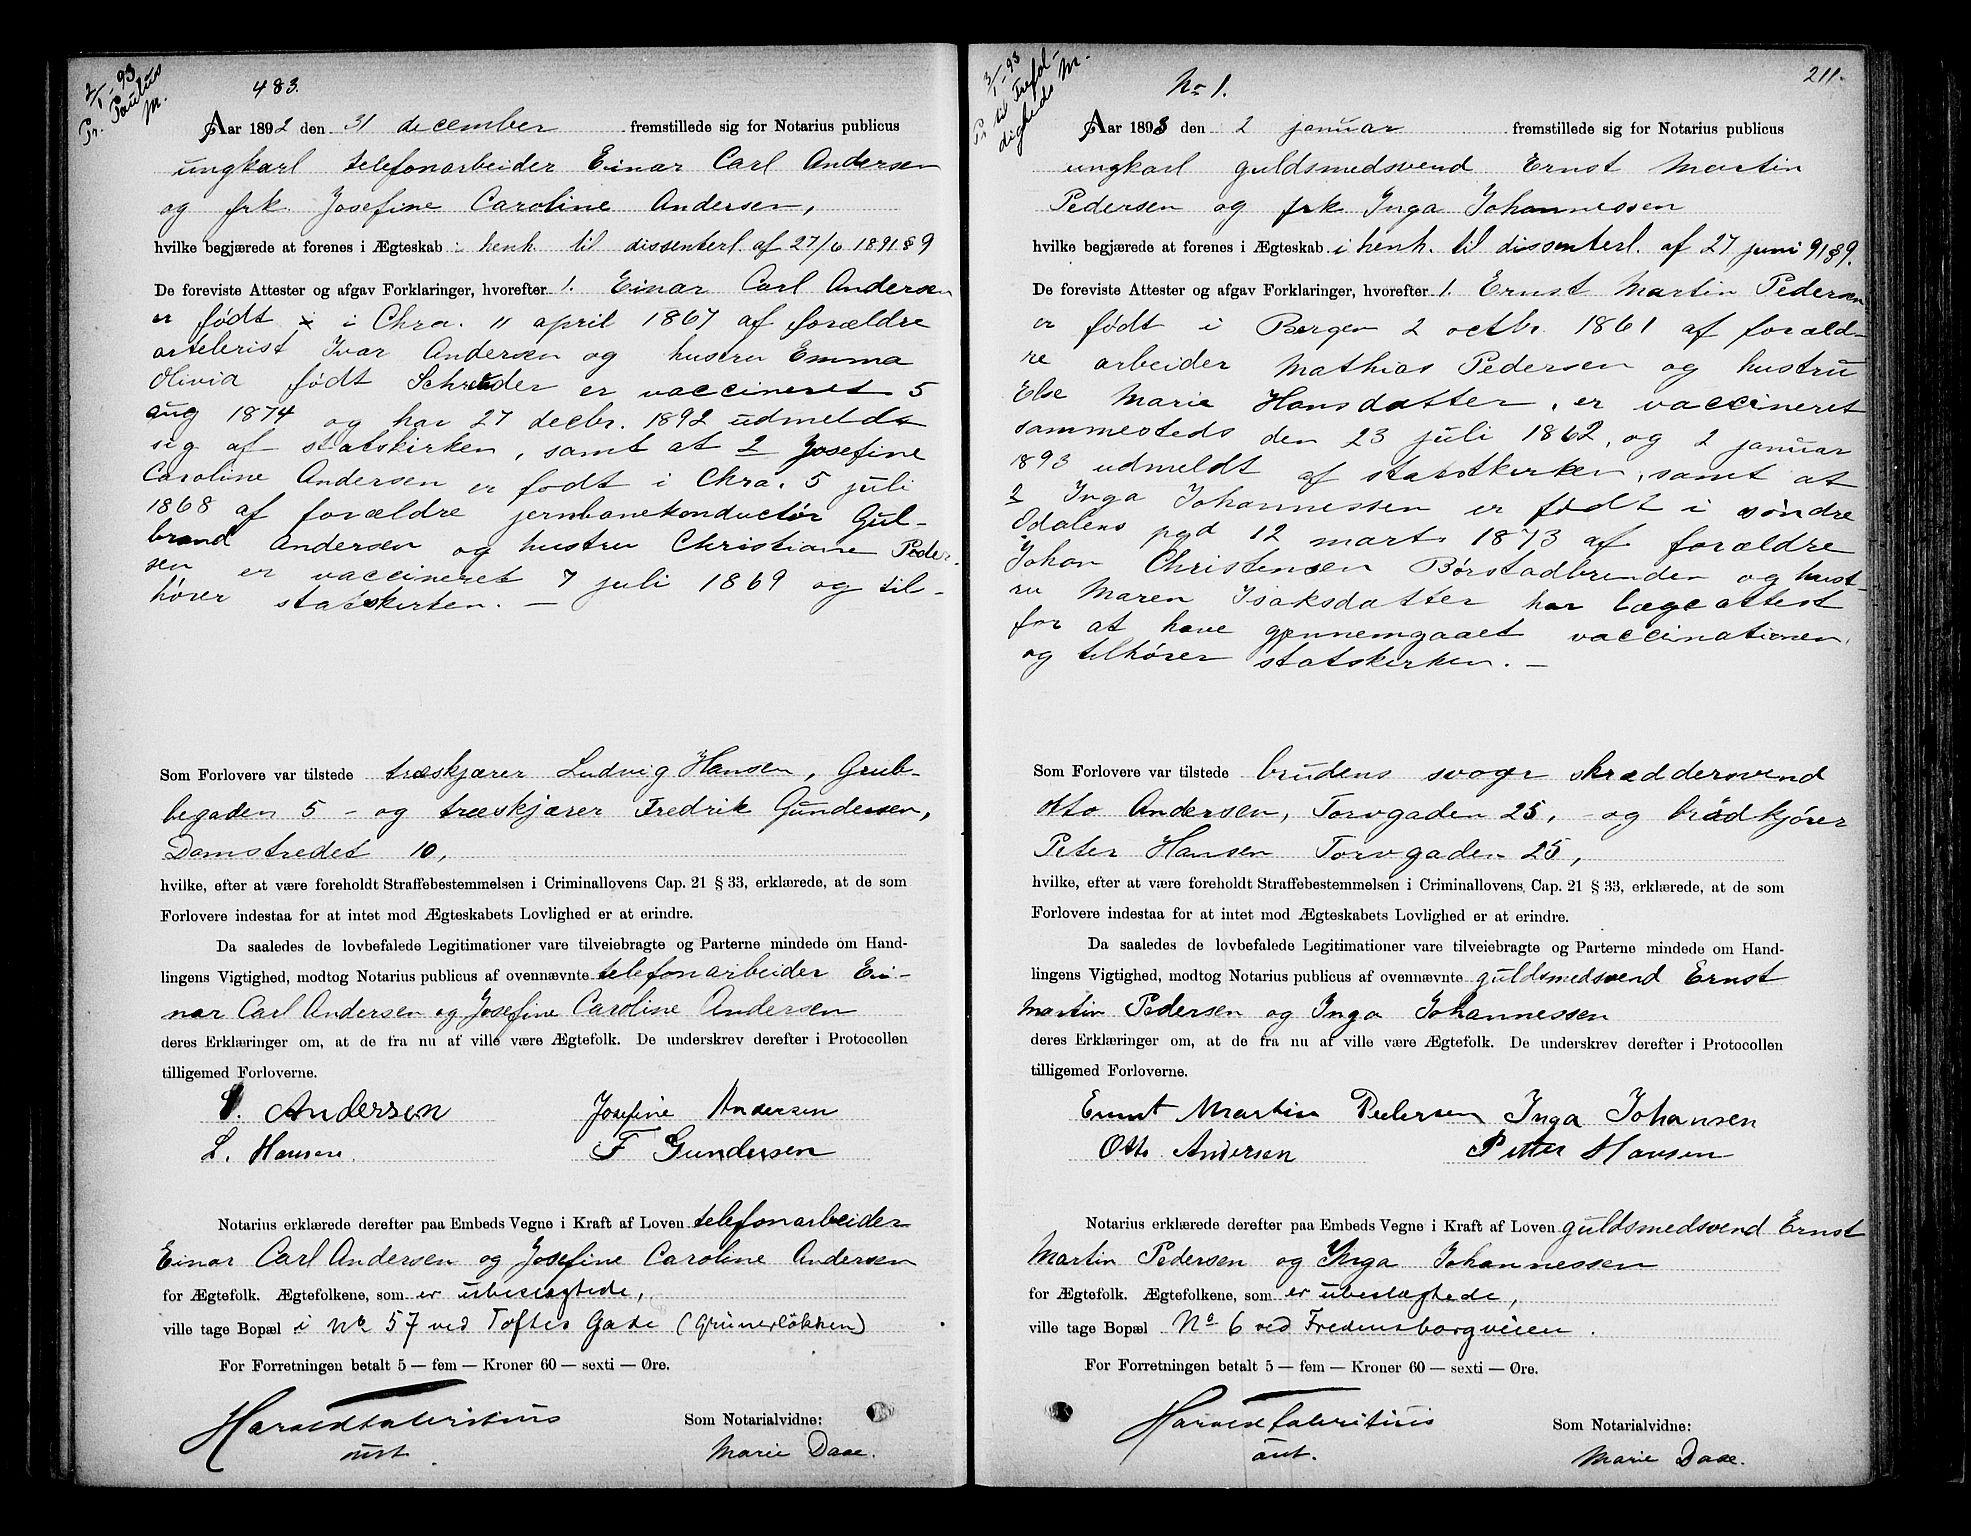 SAO, Oslo byfogd avd. I, L/Lb/Lbb/L0001: Notarialprotokoll, rekke II: Vigsler, 1892-1893, s. 210b-211a